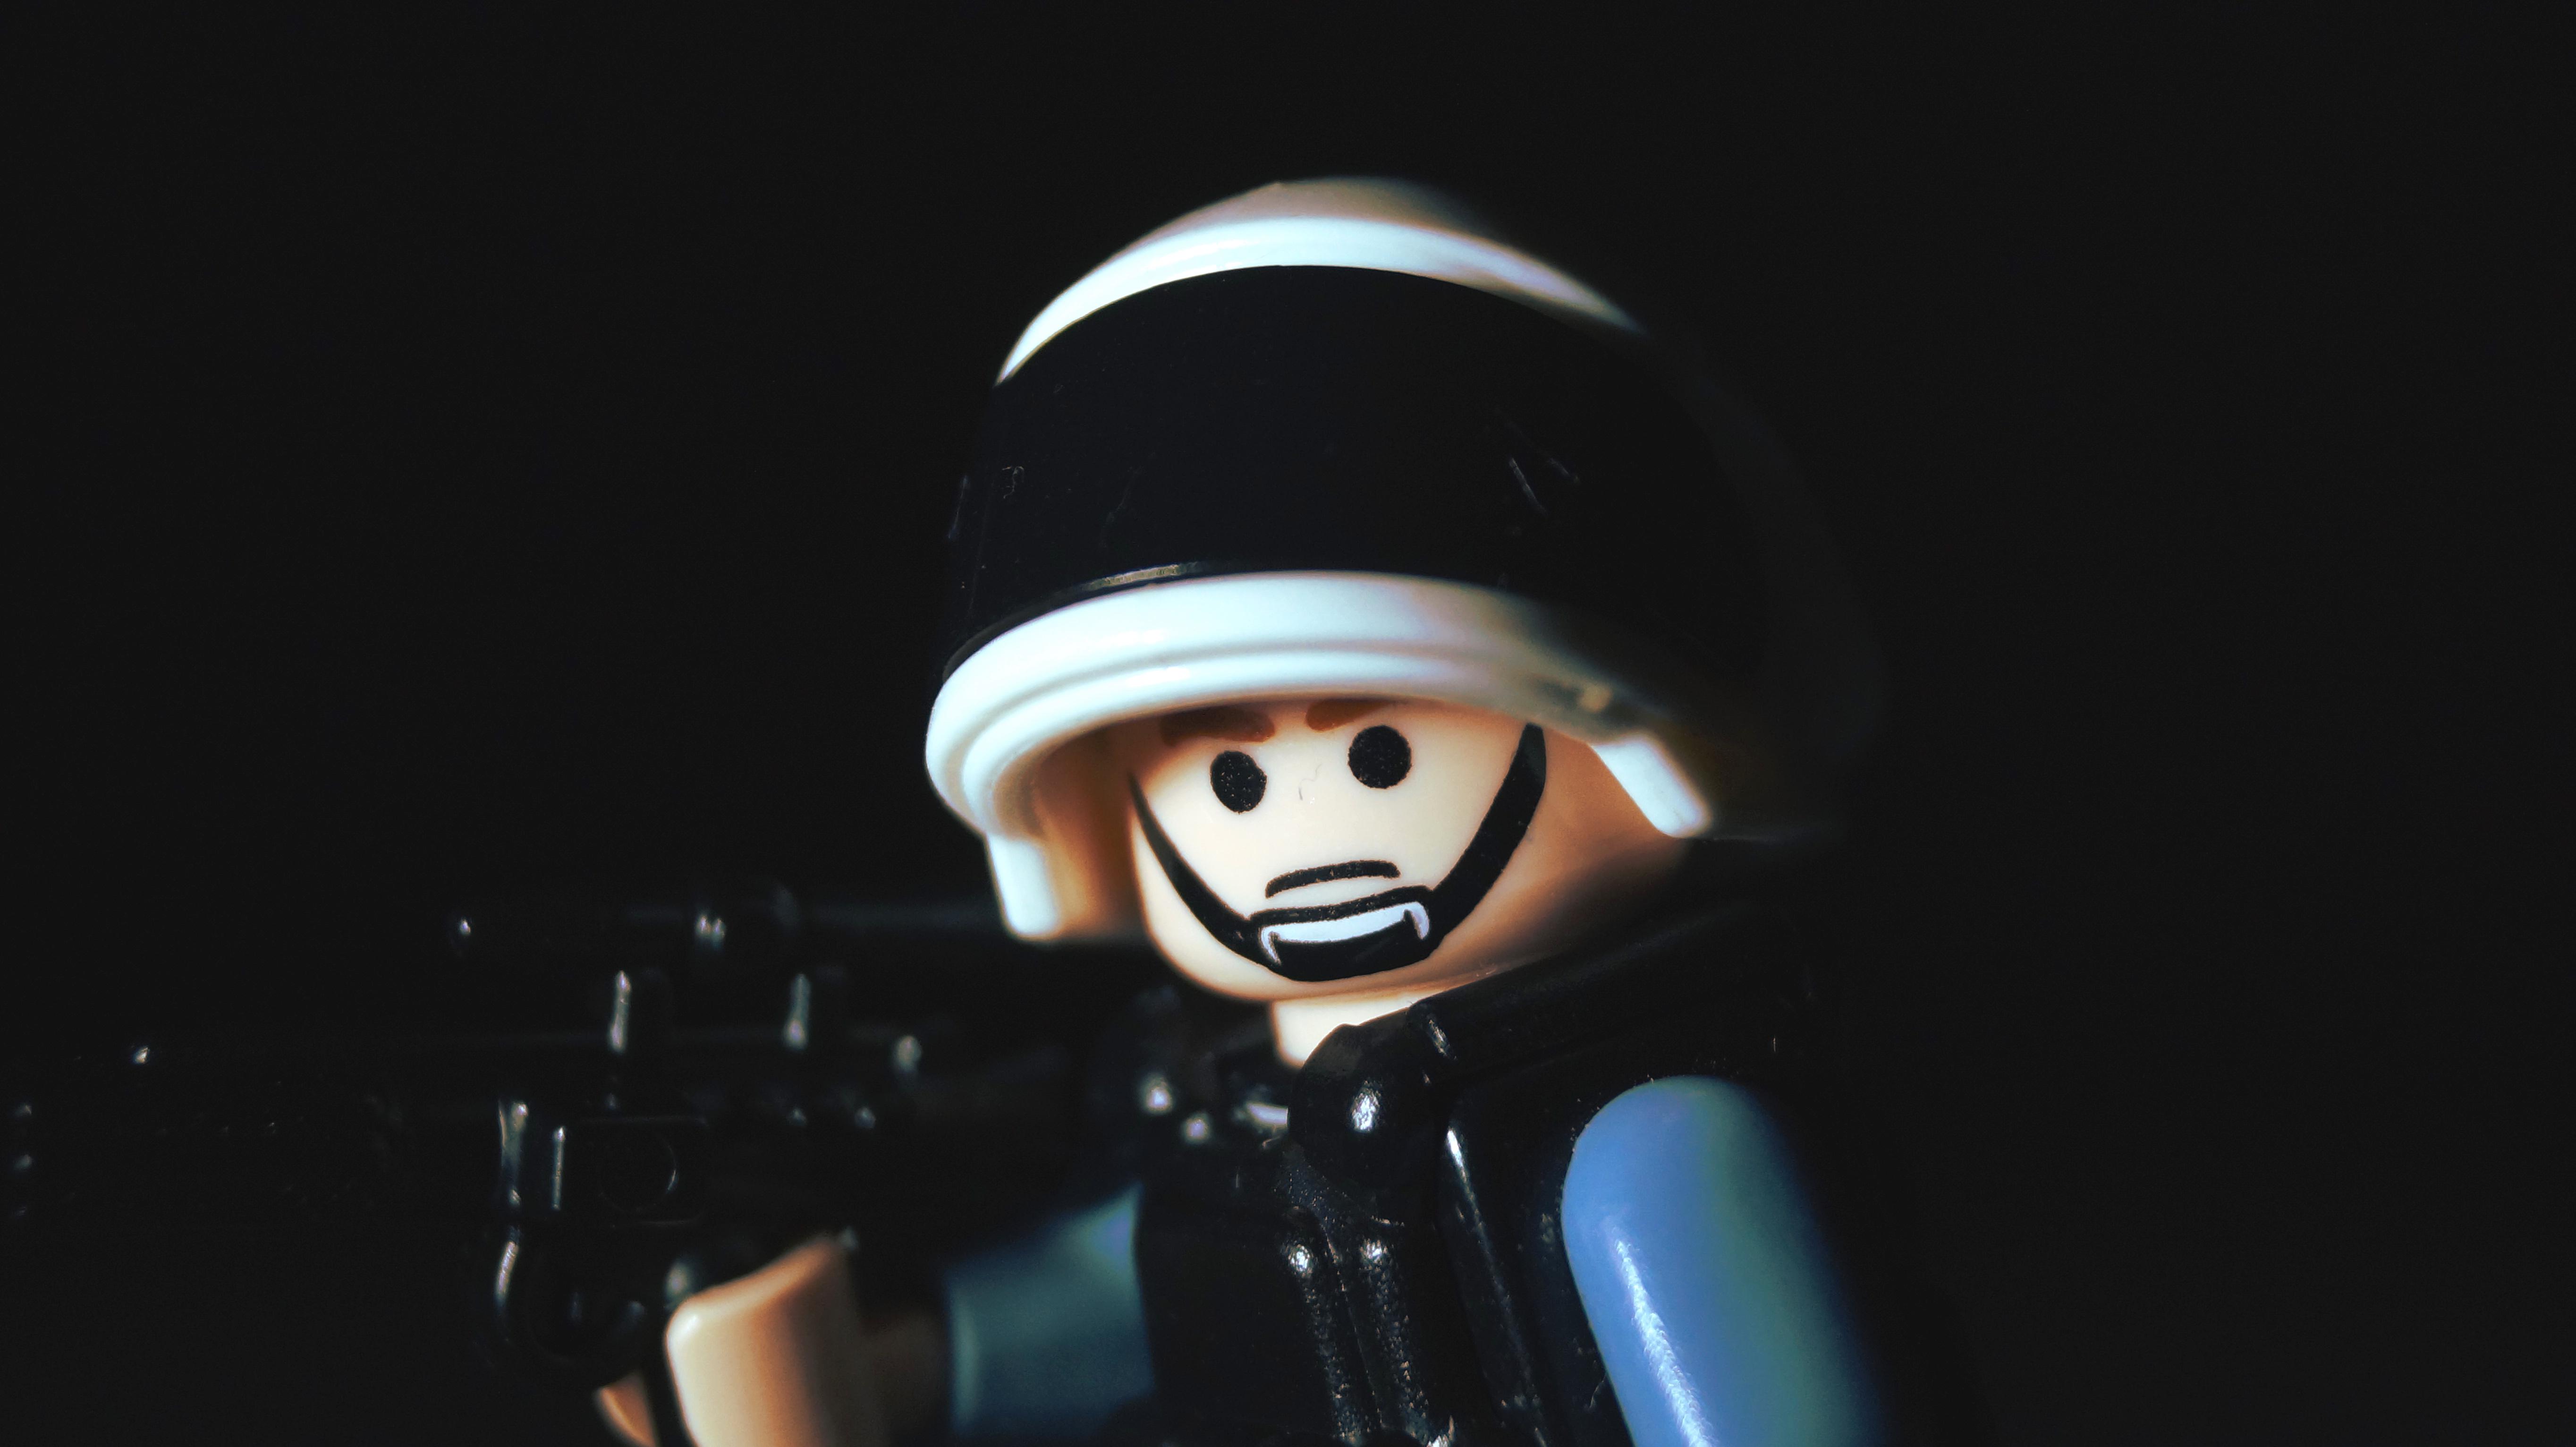 Wallpaper Lego Starwars Star Wars Rebel Rebellion Rebels